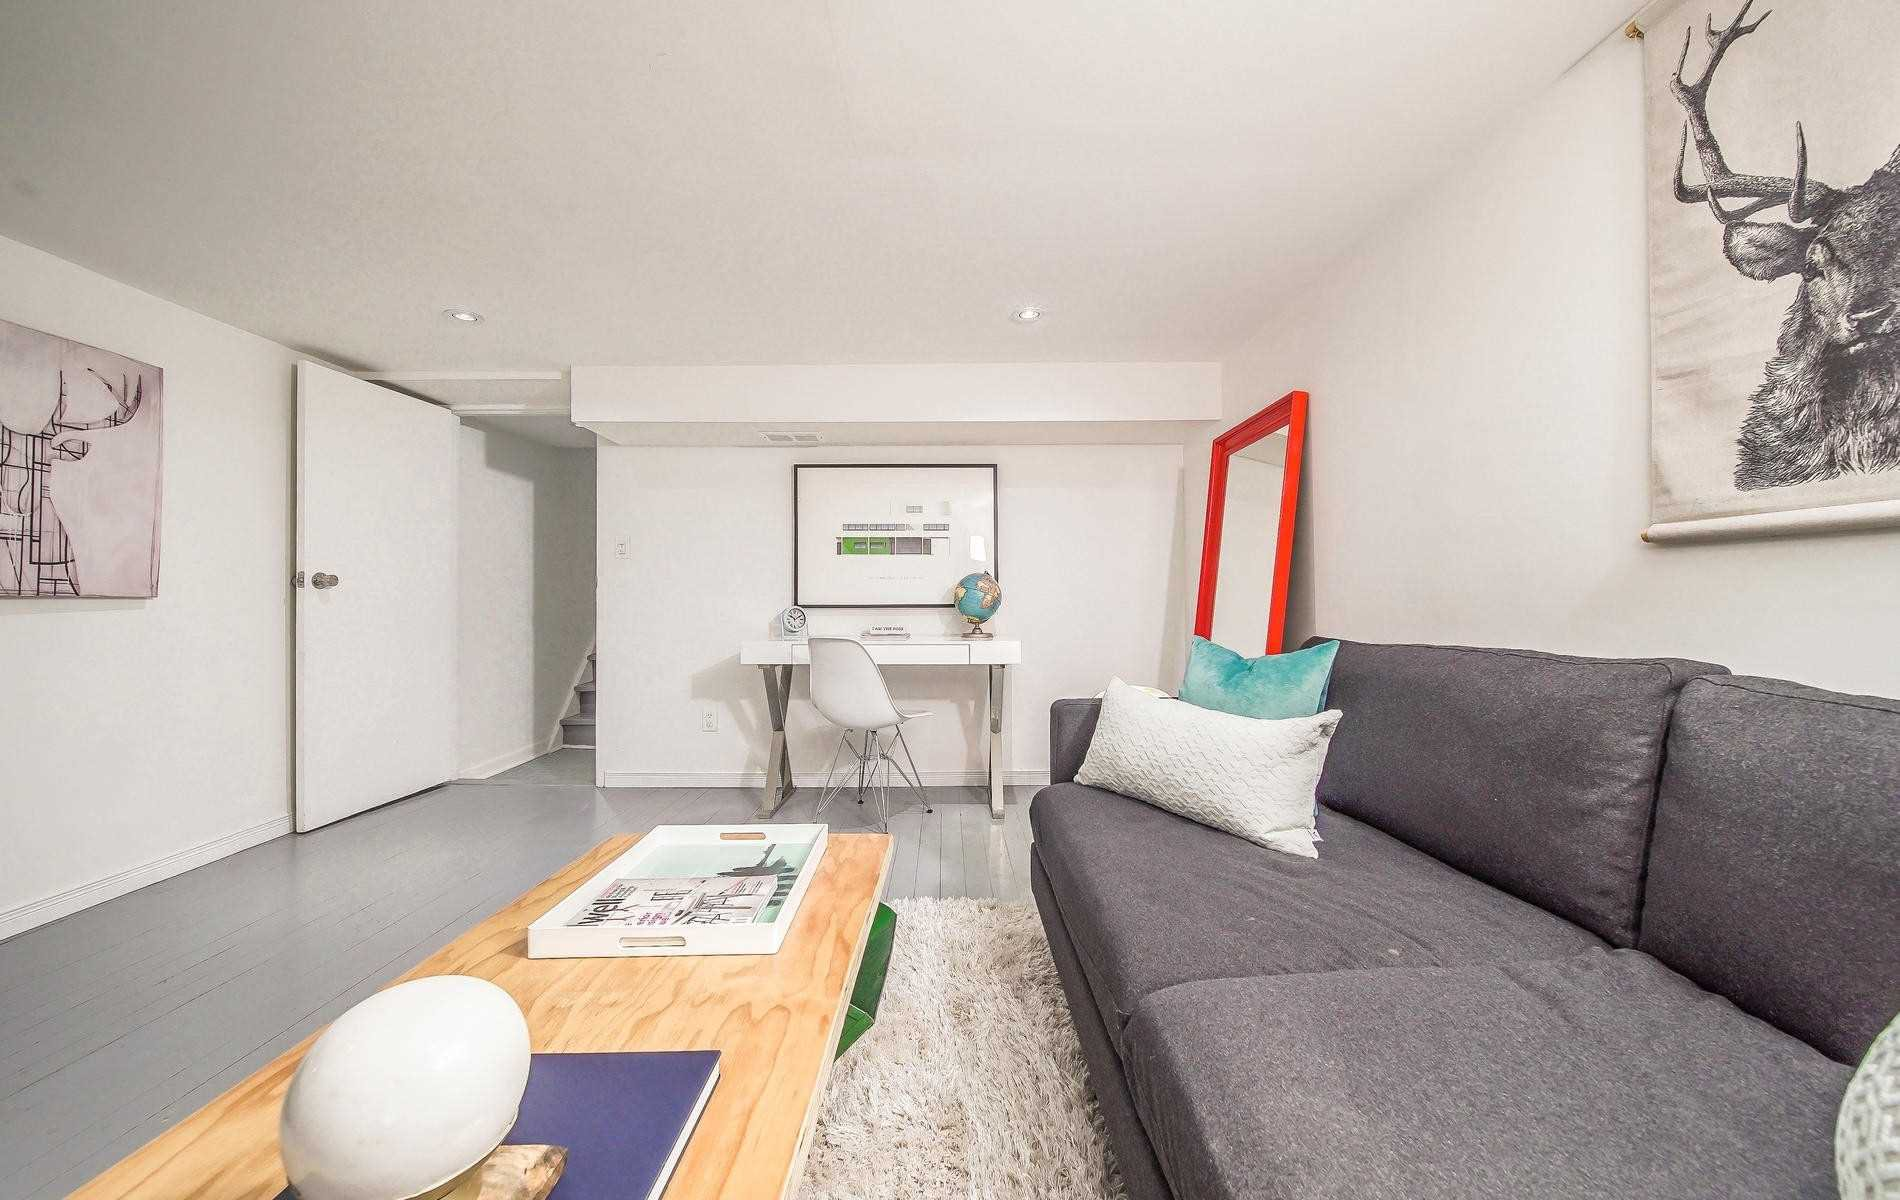 Photo 18: Photos: 64 Larchmount Avenue in Toronto: South Riverdale House (2-Storey) for sale (Toronto E01)  : MLS®# E4489752